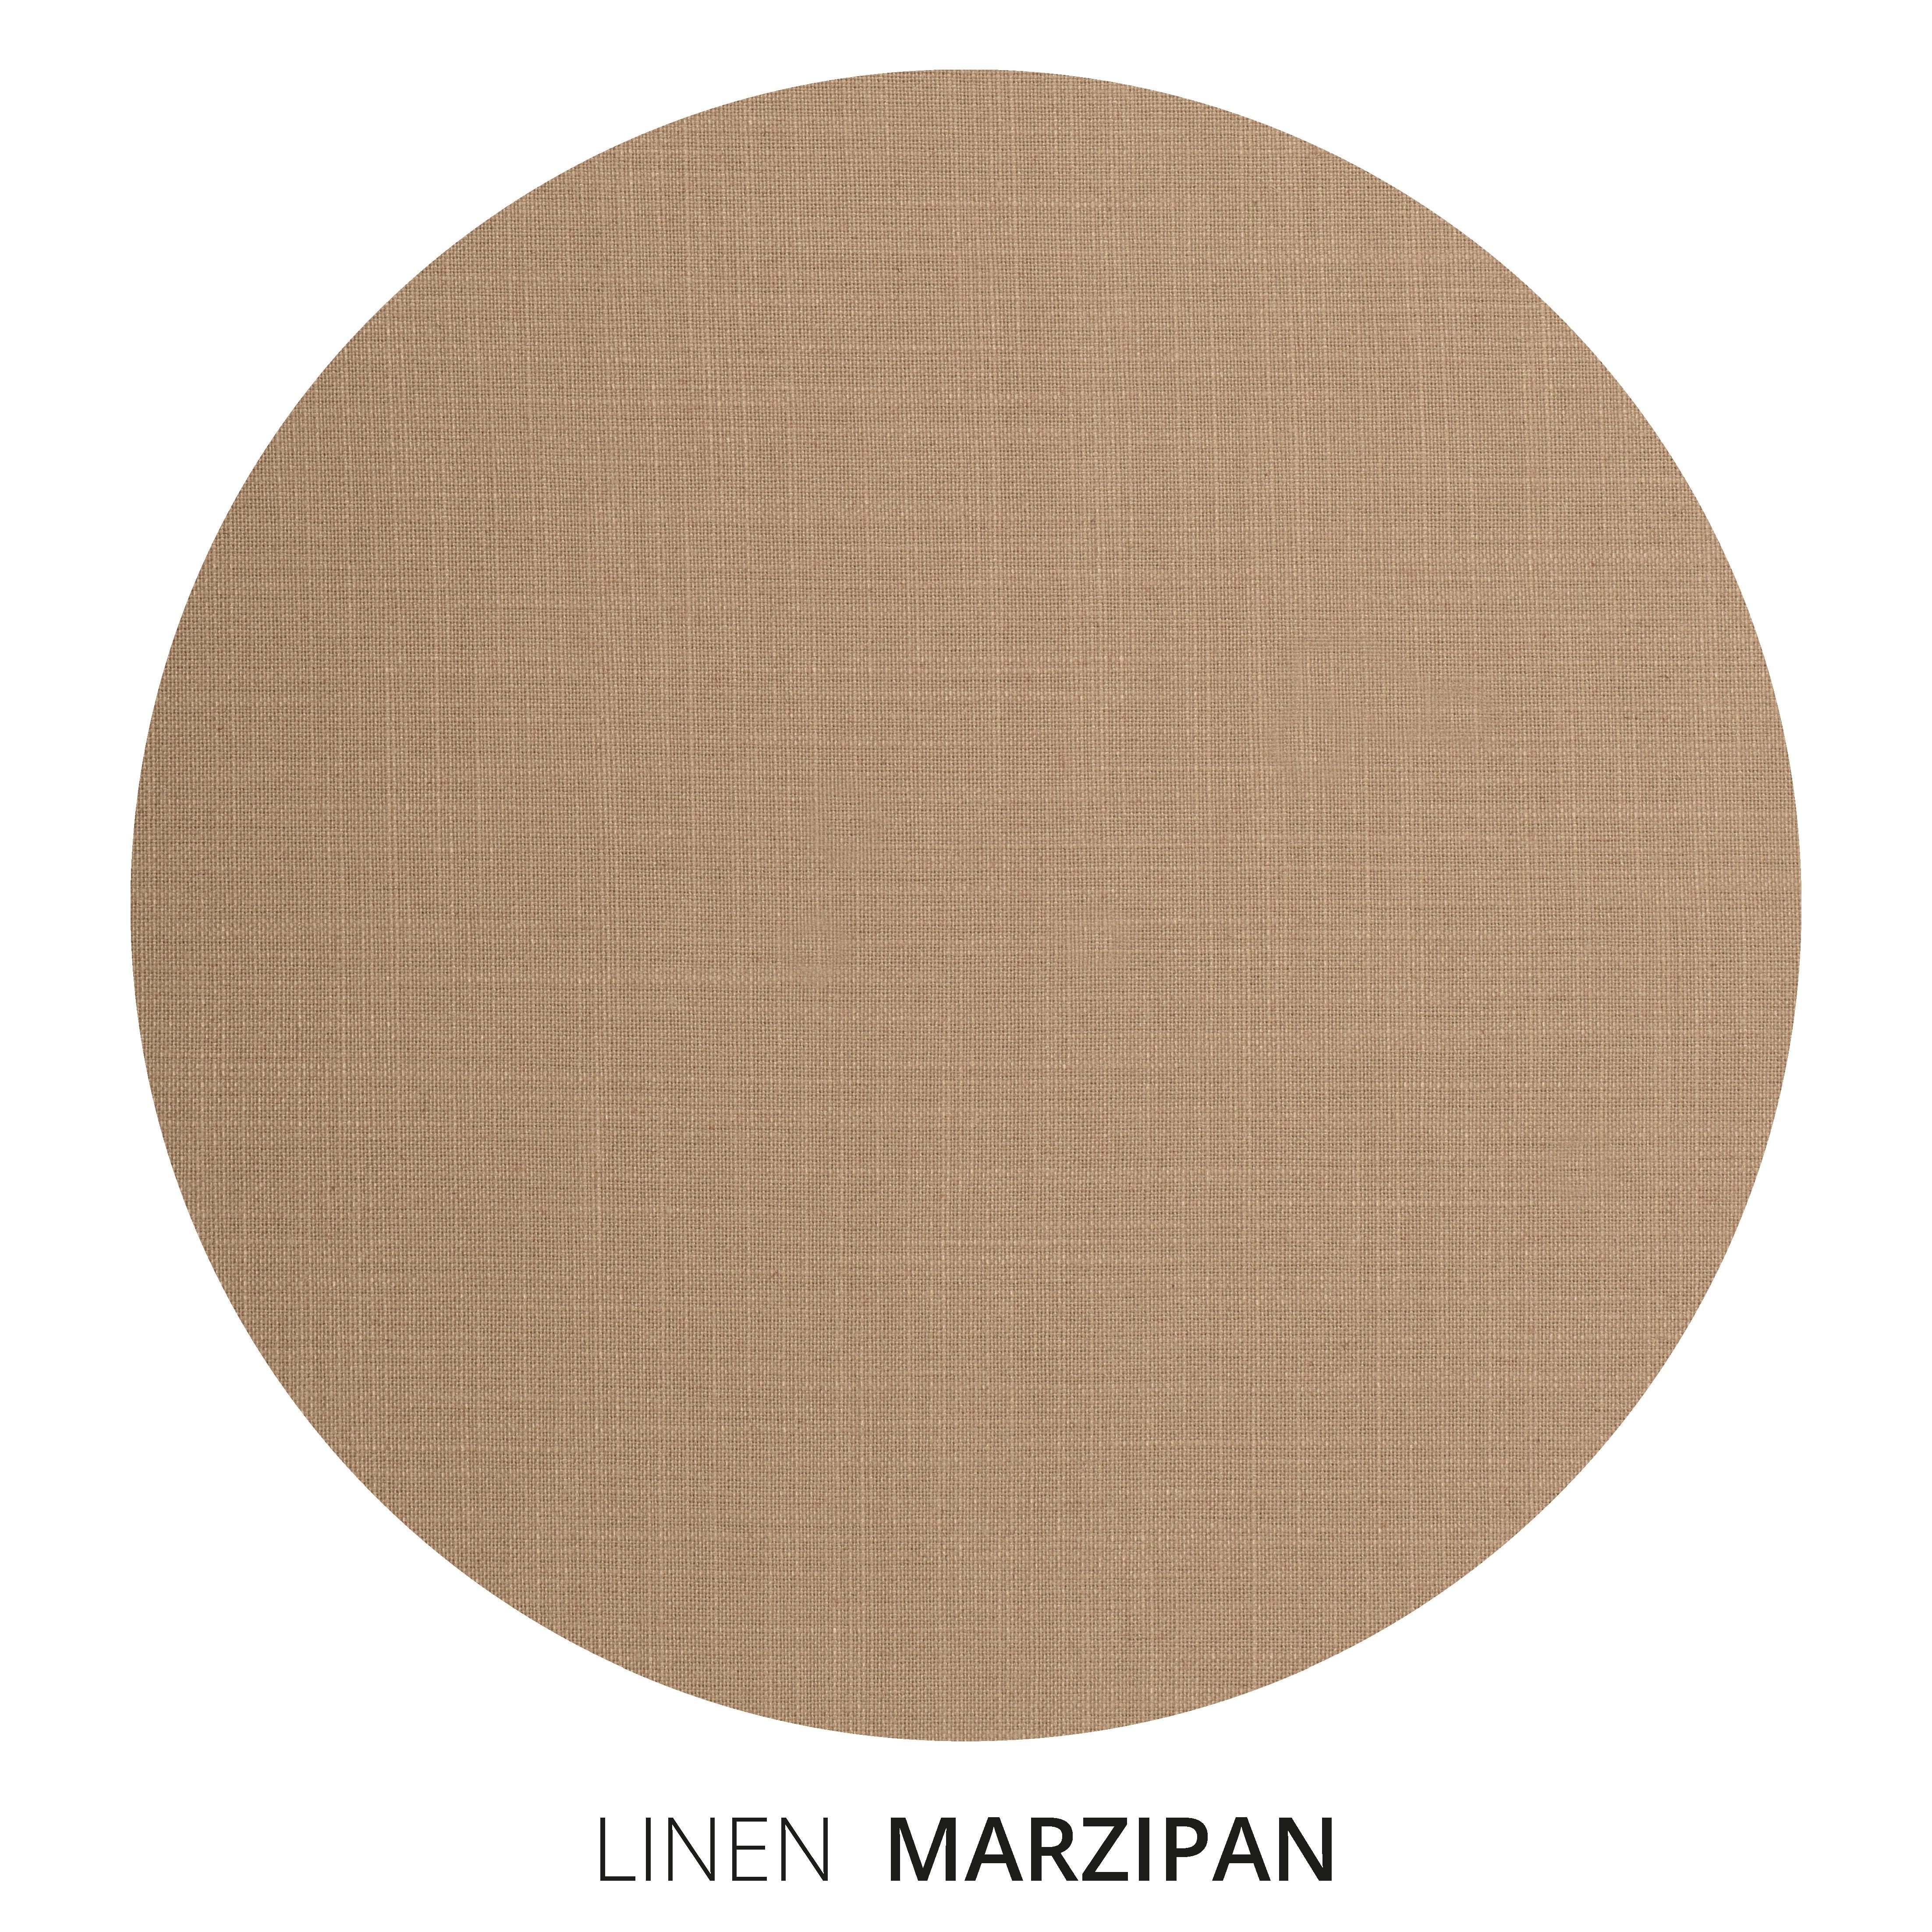 Marzipan Linen Swatch